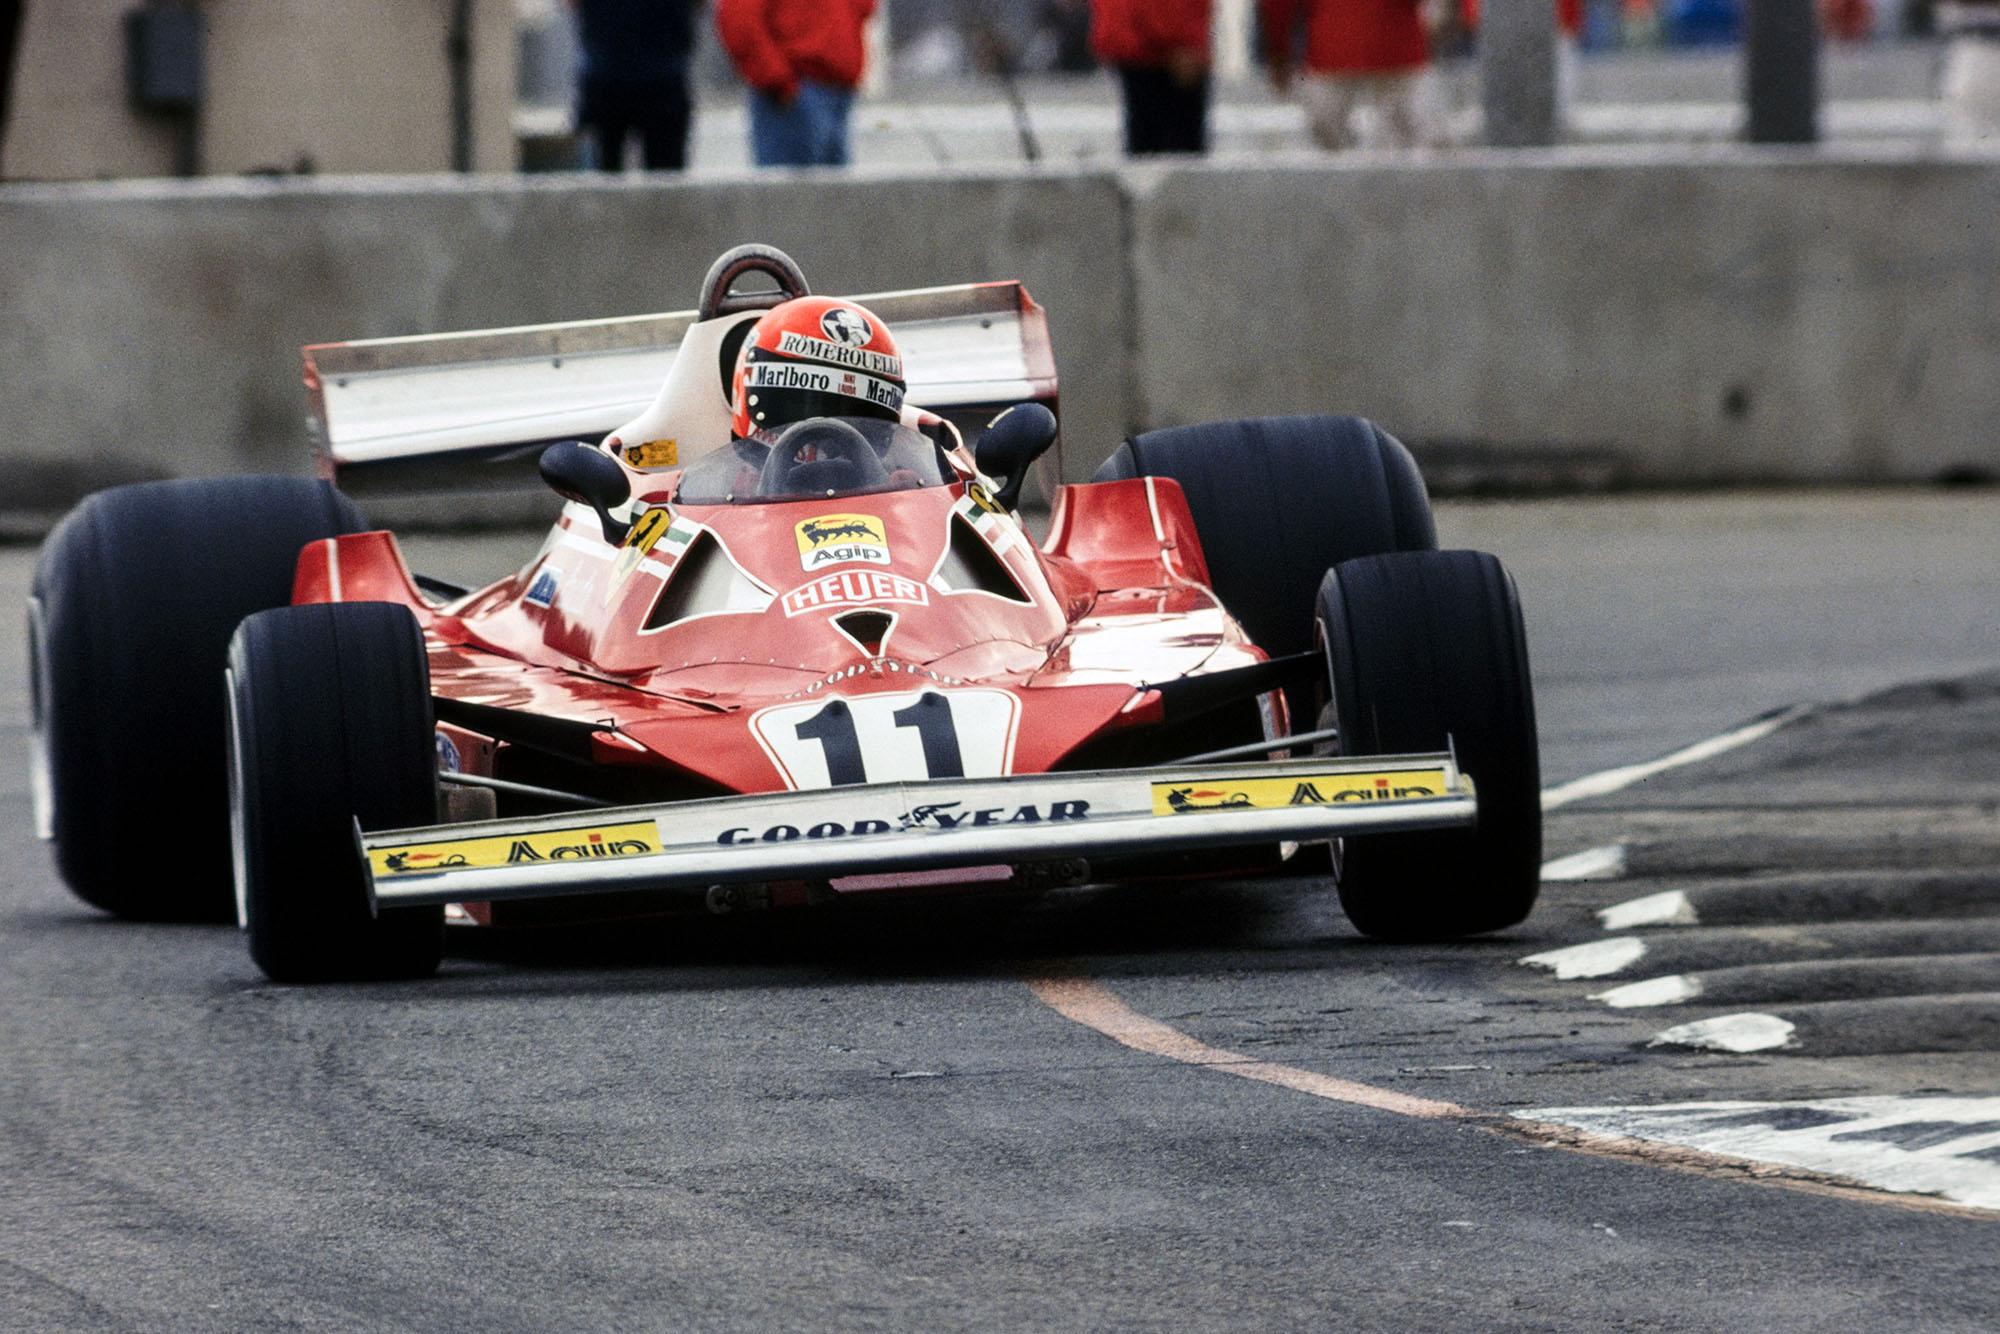 Niki Lauda (Ferrari), United States Grand Prix West, Long Beach.